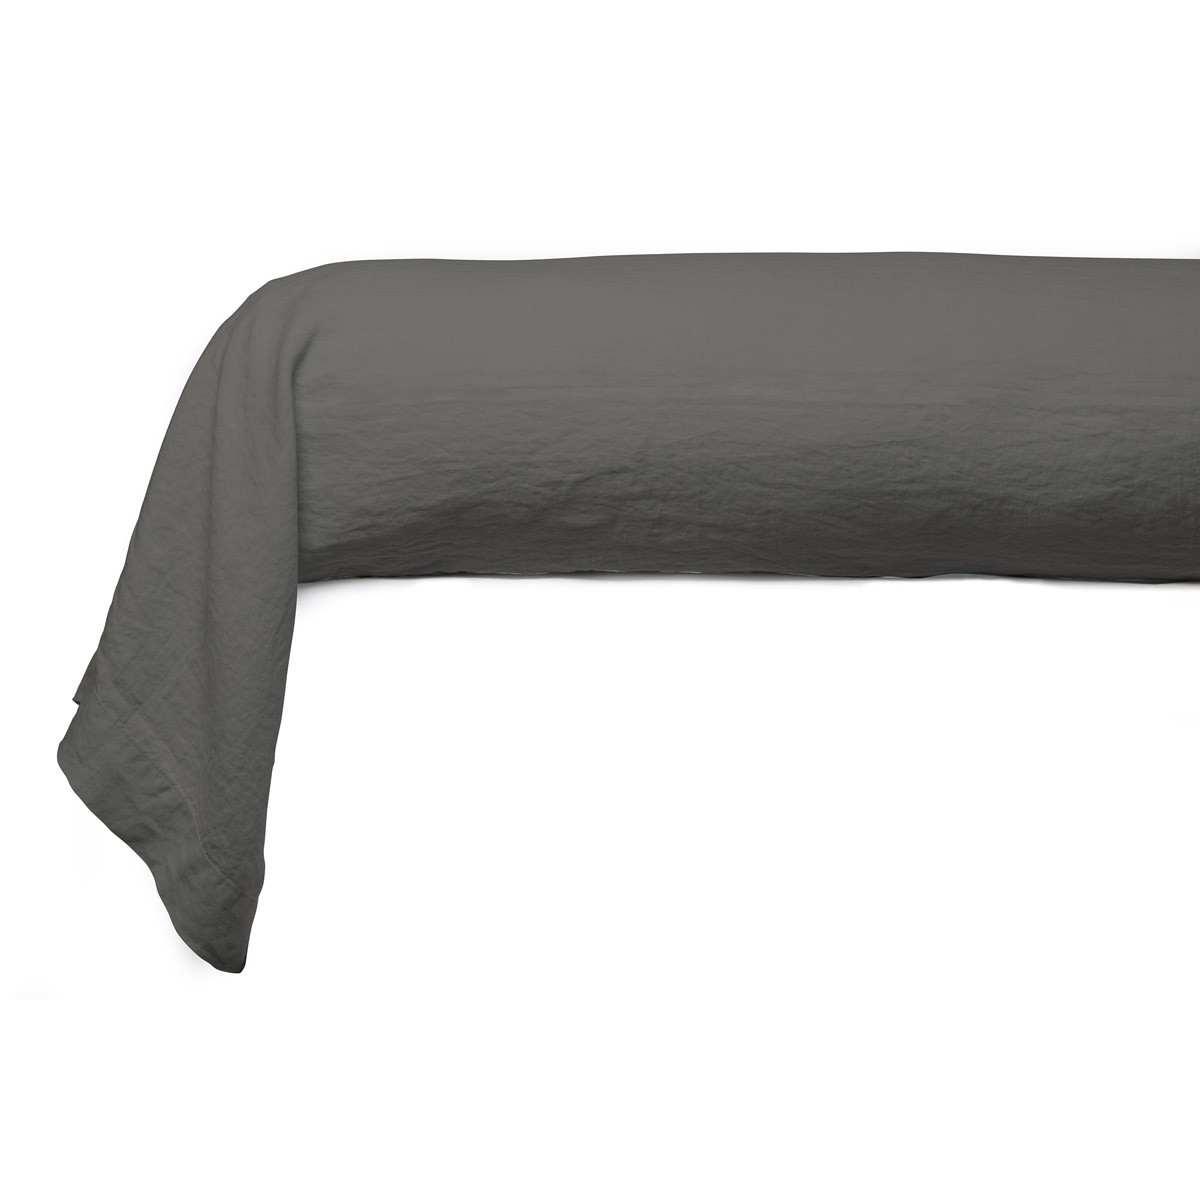 parure lin lav linge de lit de qualit tradition des. Black Bedroom Furniture Sets. Home Design Ideas